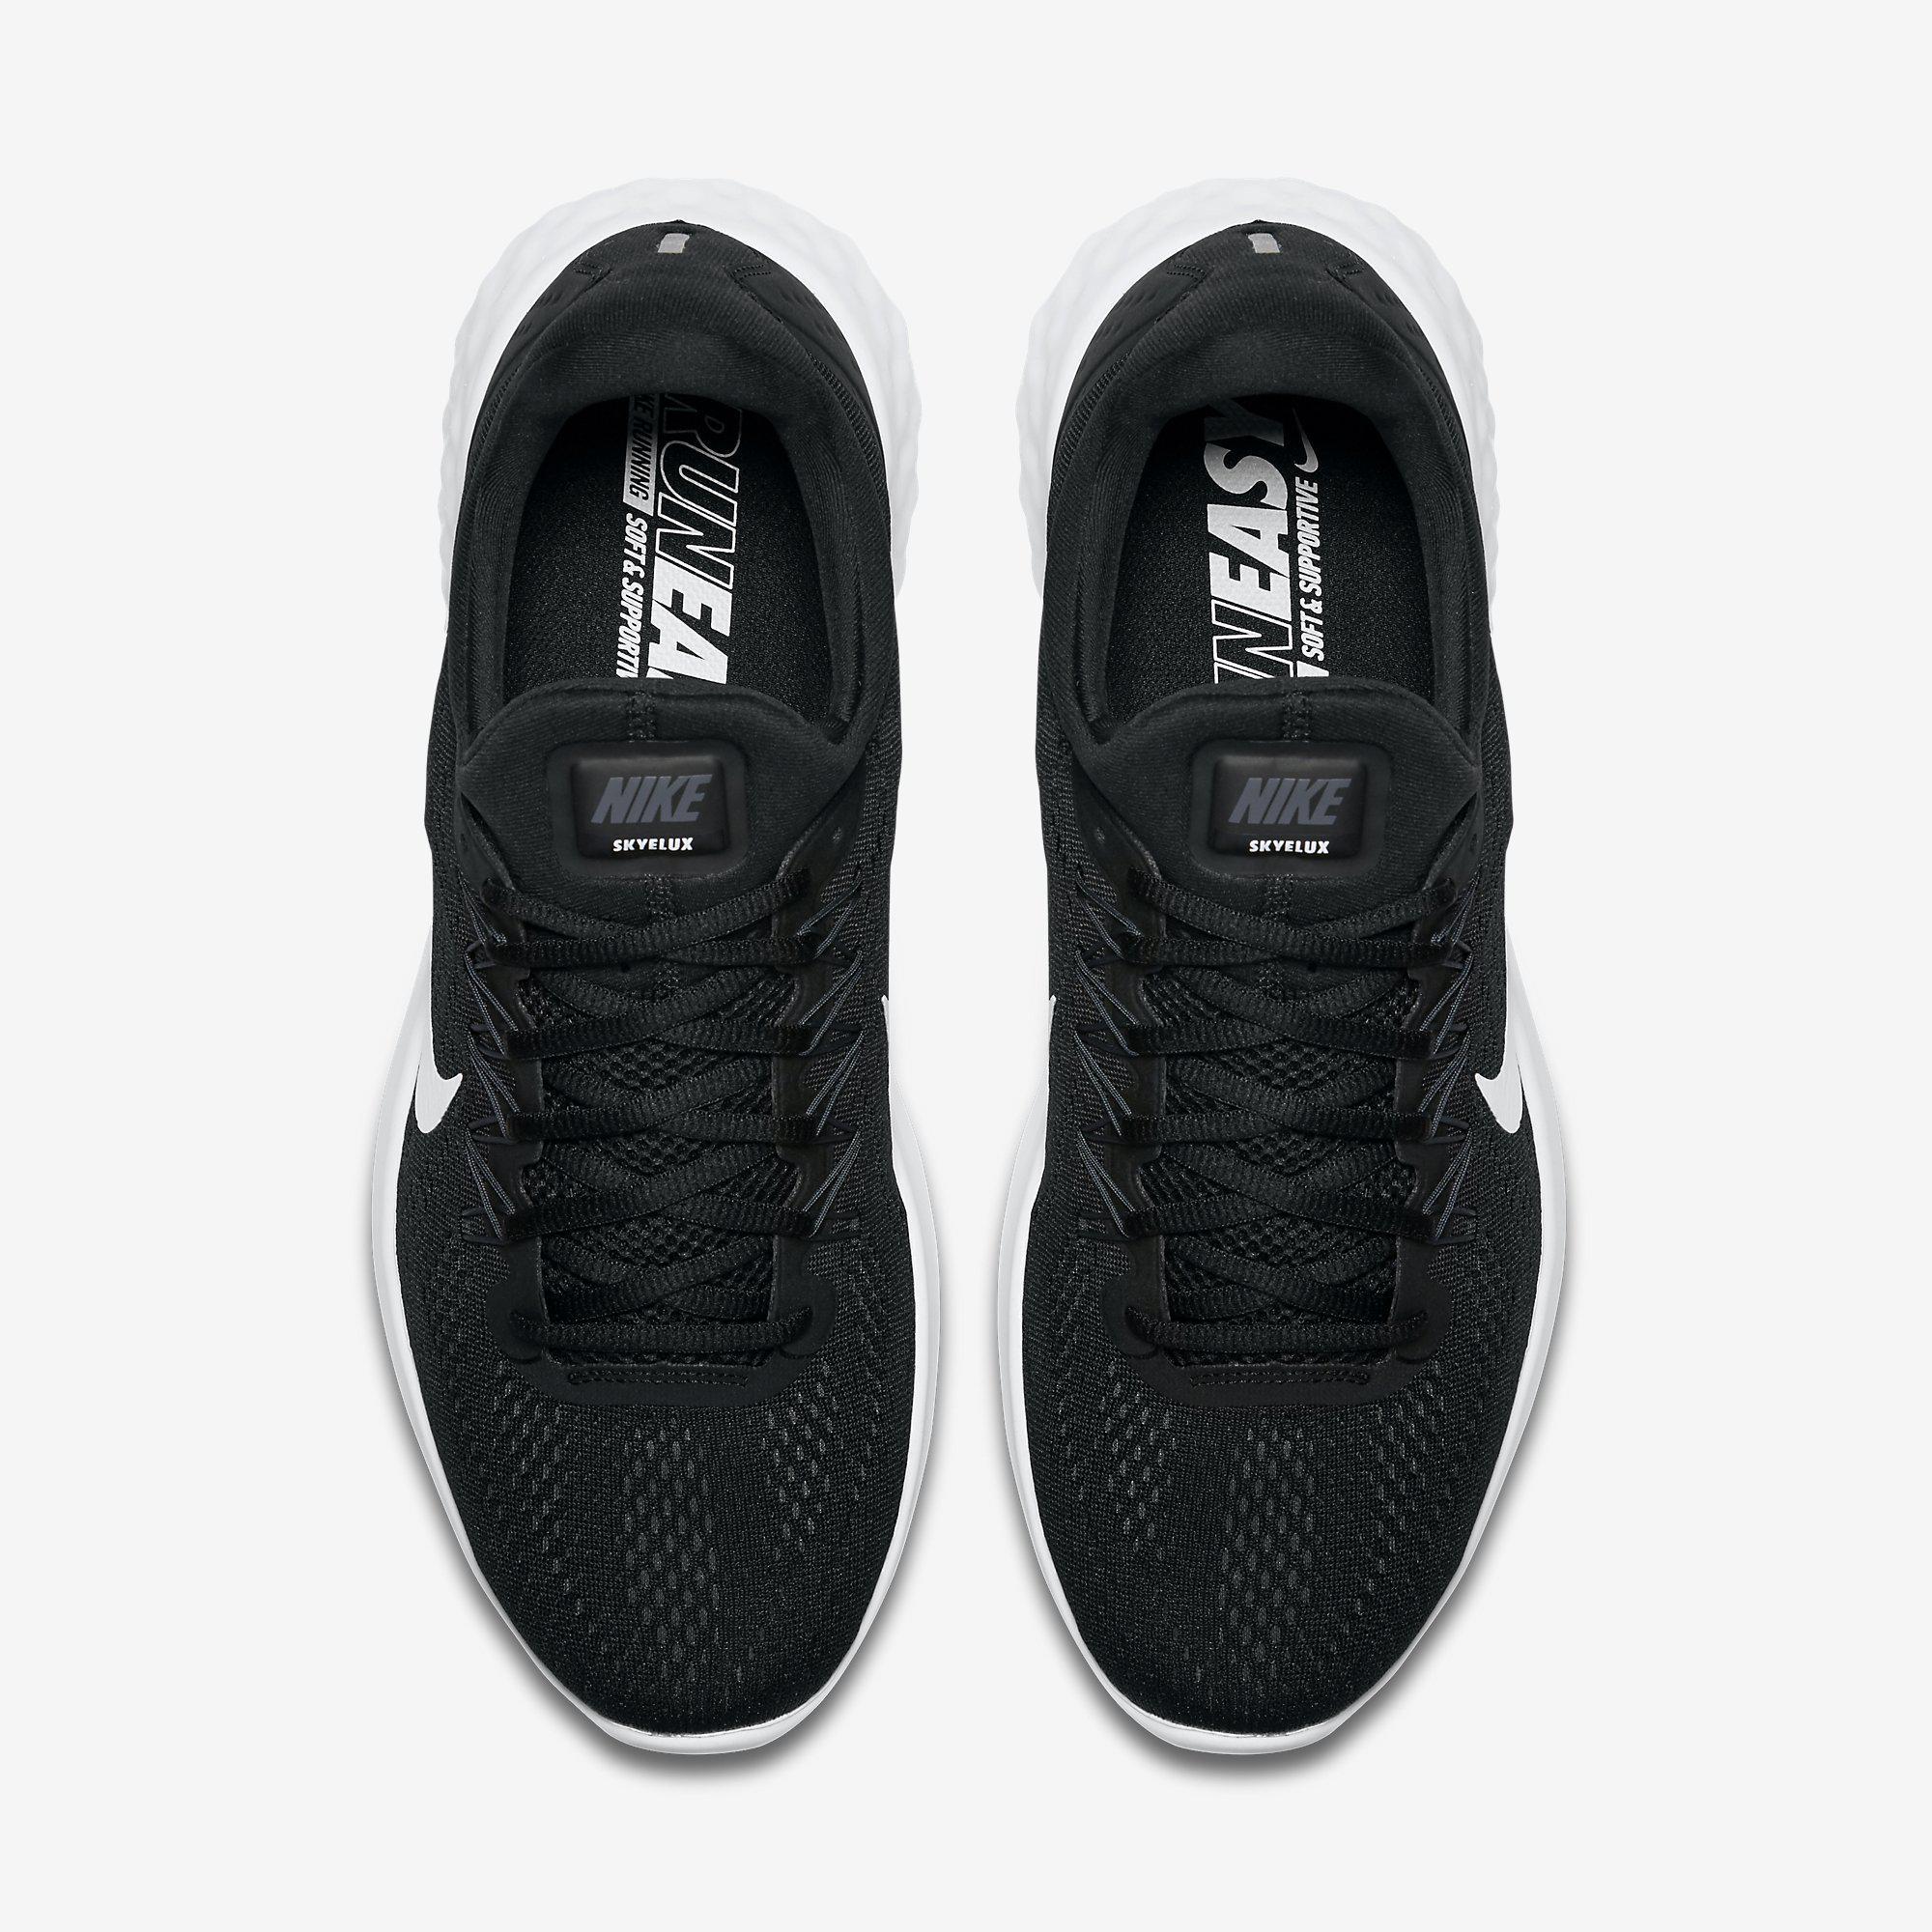 4bc5a5dd42a Nike Mens Lunar Skyelux Running Shoes - Black White - Tennisnuts.com